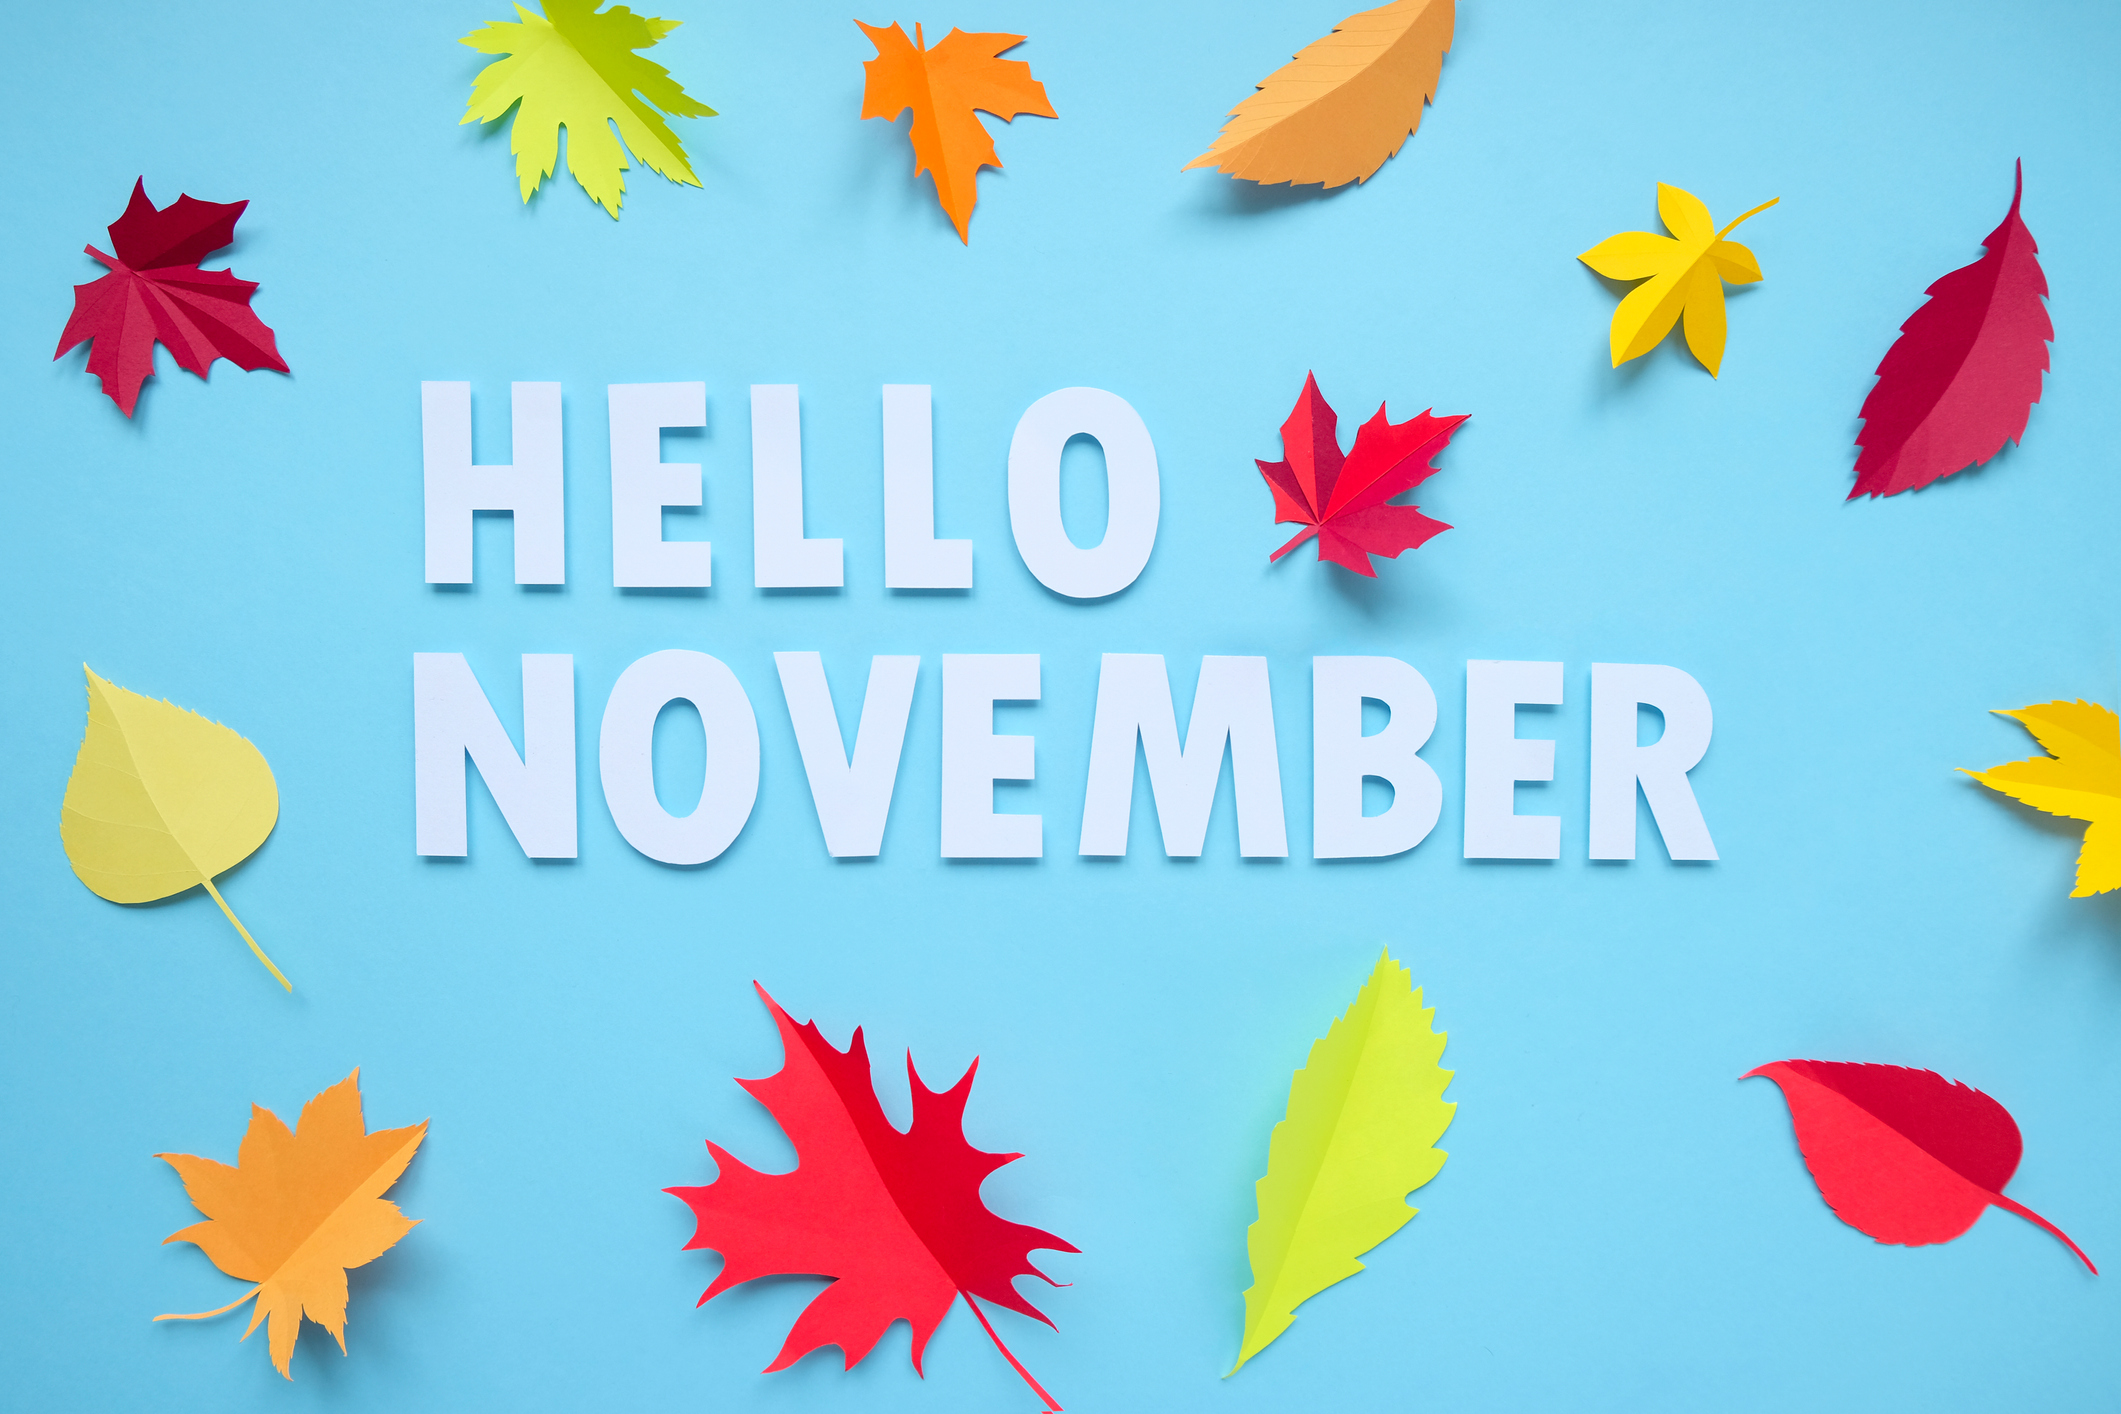 Hello November - November virtual jobs - Virtual Vocations telecommute and remote jobs